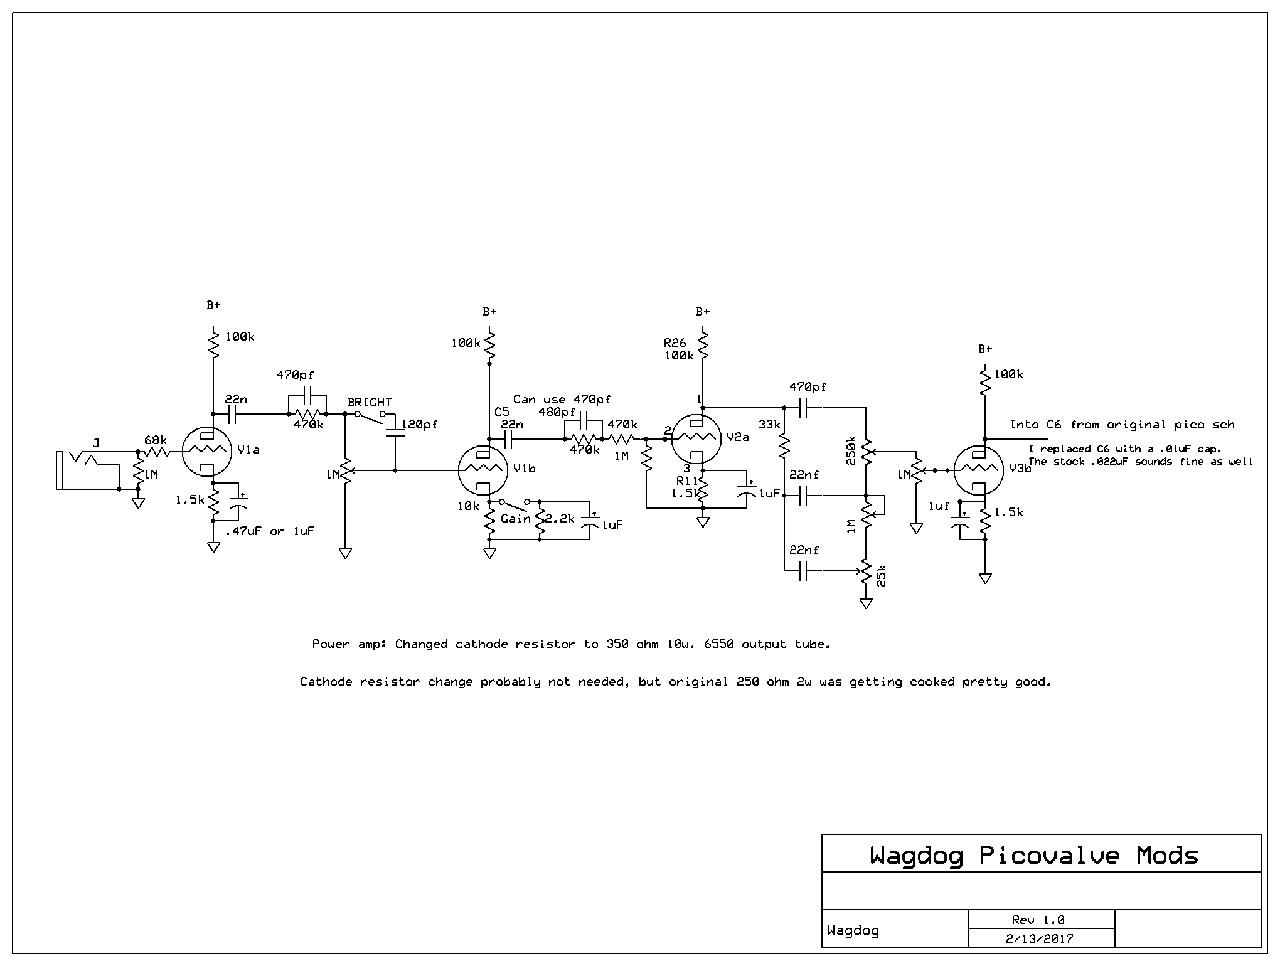 Picovalve Mods Filter Cap Schematic Preamp